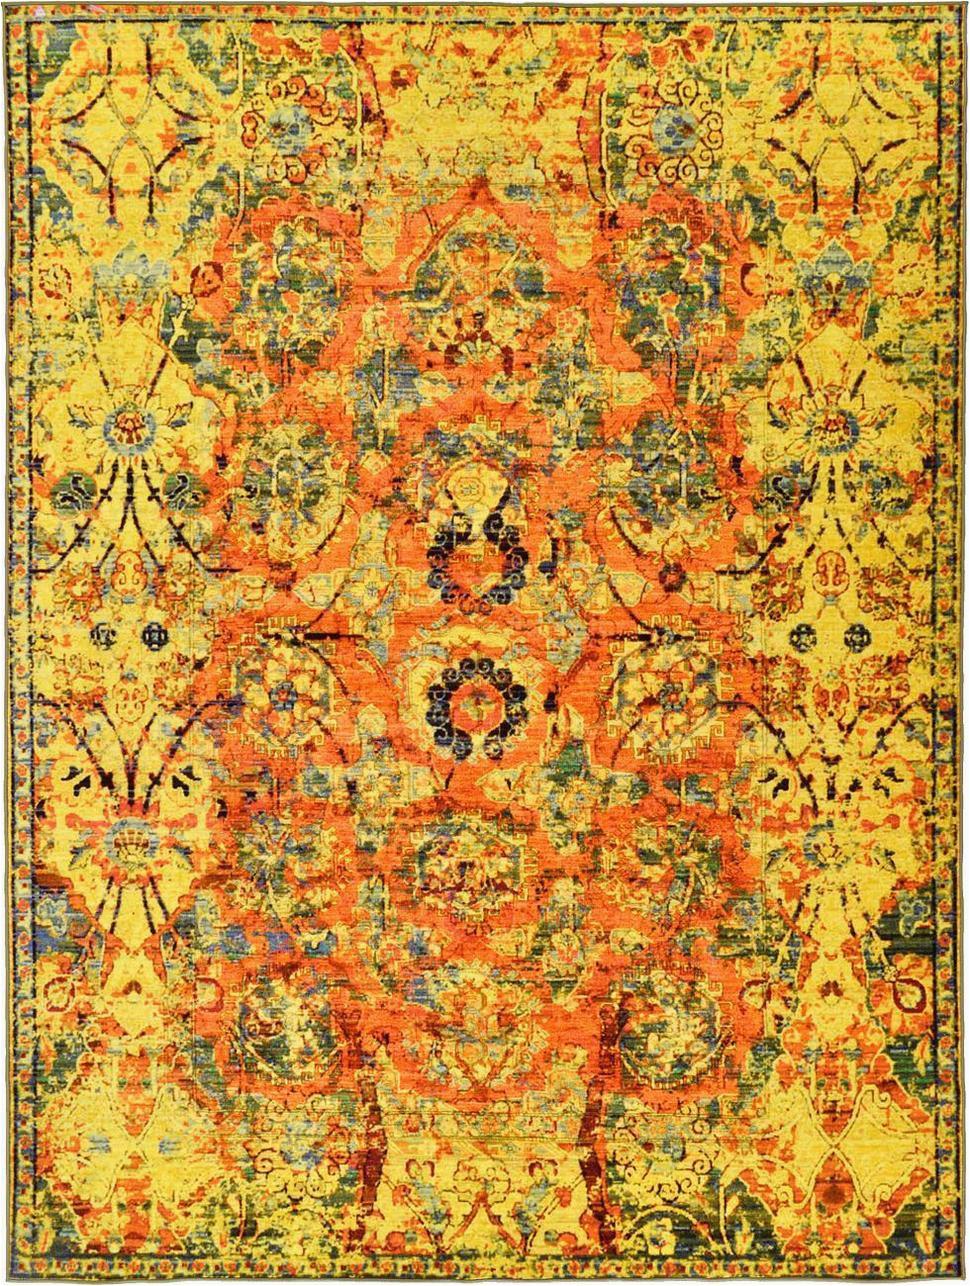 8e yellow turkish eclat area rug thumb 970xauto